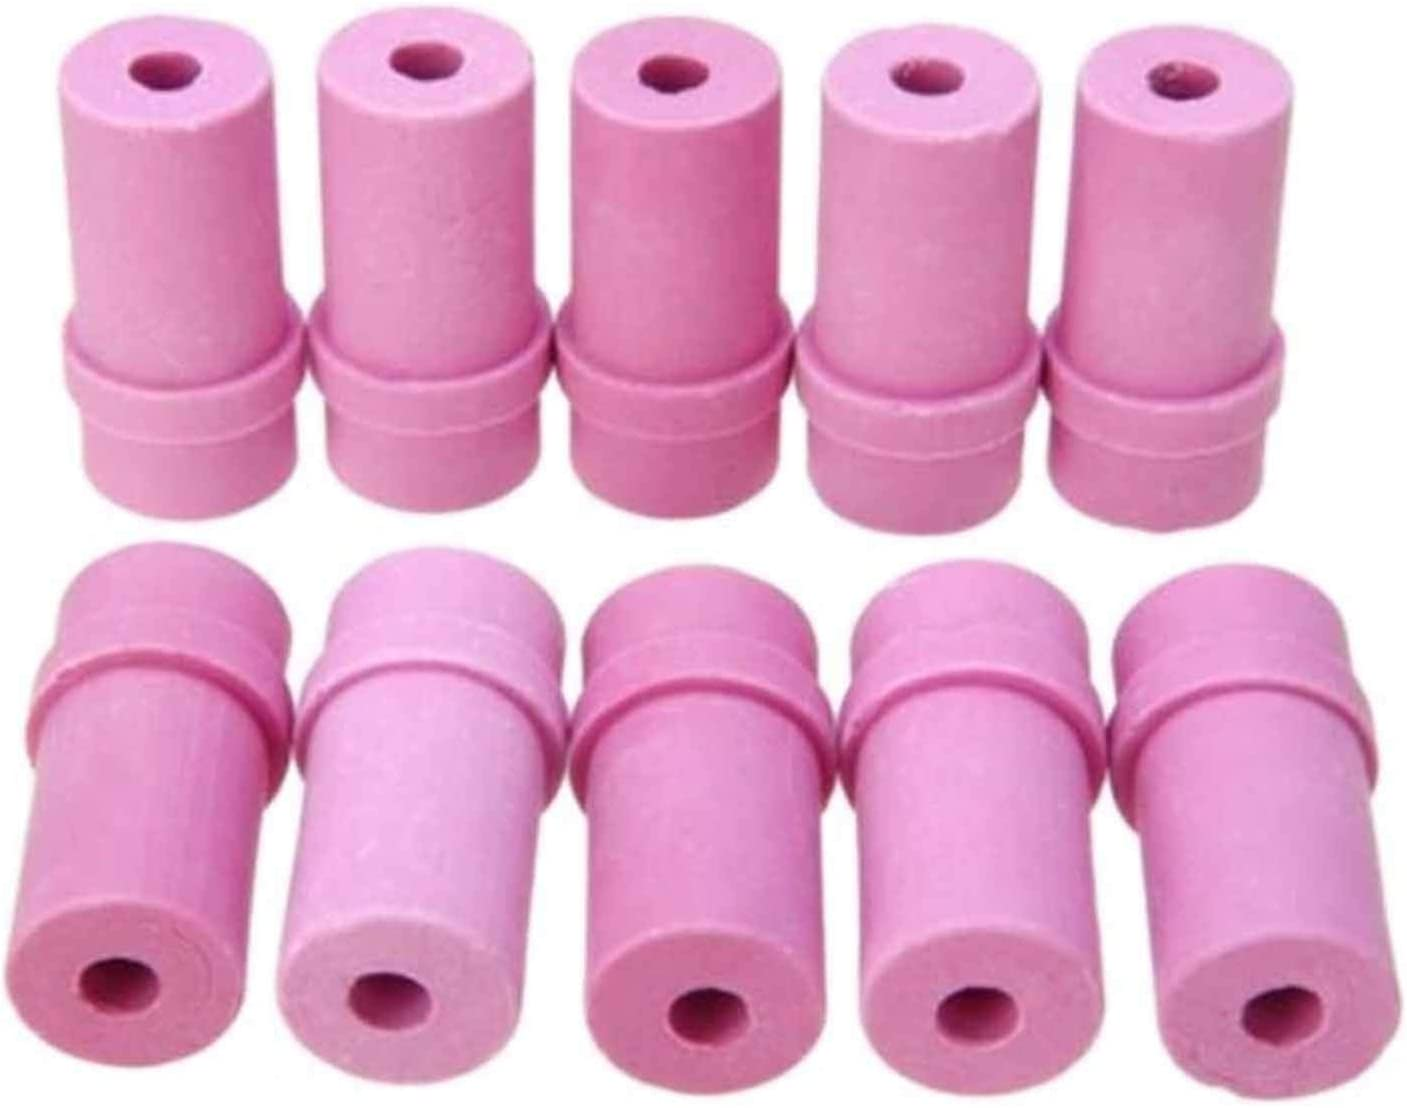 Size : 4mm IINSSDJ Ceramic Sandblast Nozzle Air Sandblaster Tips for Industrial Machinery Parts Metallurgical Foundry Pneumatic Blasting Tools 10pcs